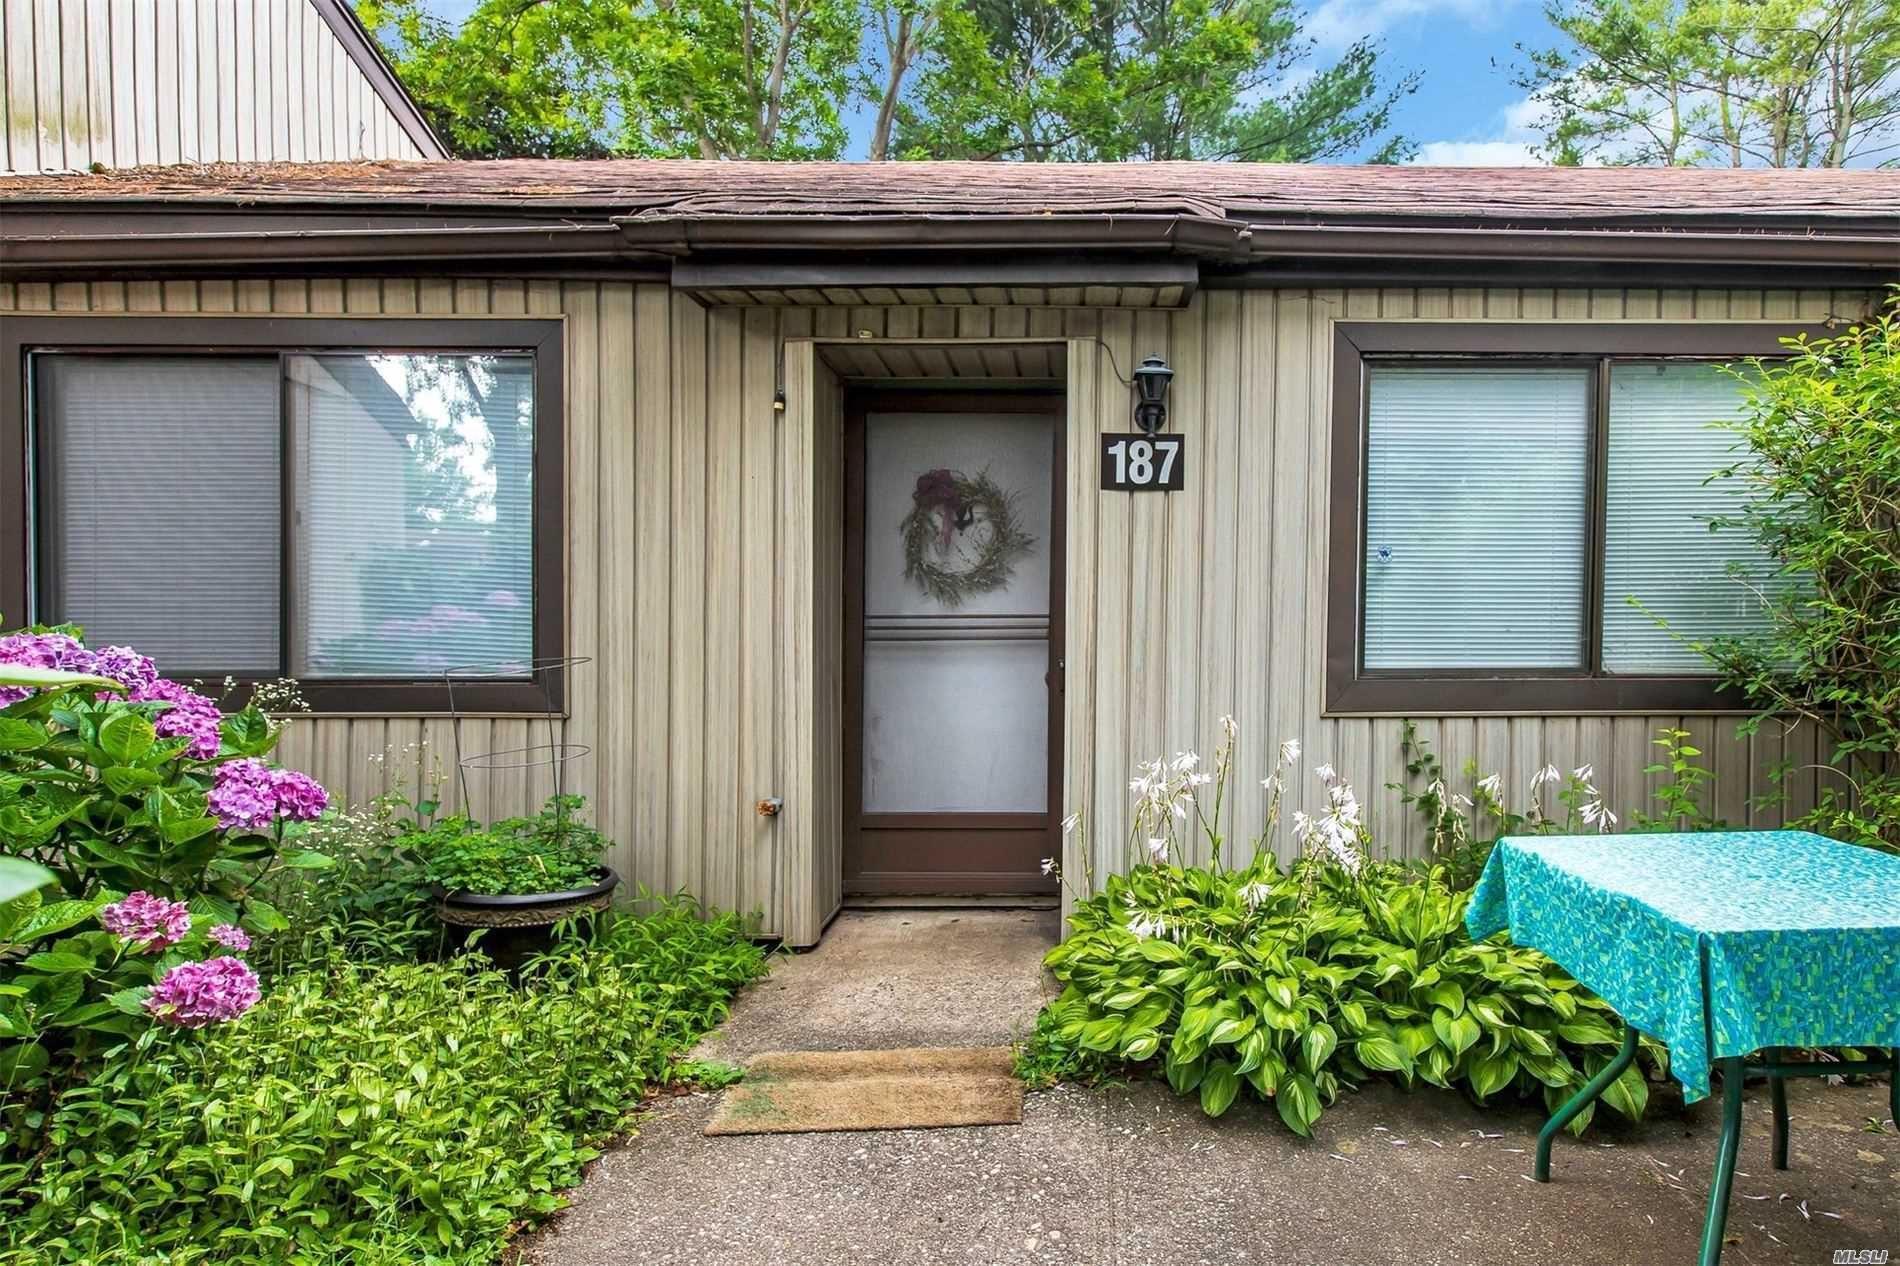 187 Strathmore Gate Dr, Stony Brook, NY 11790 - MLS#: 3235221